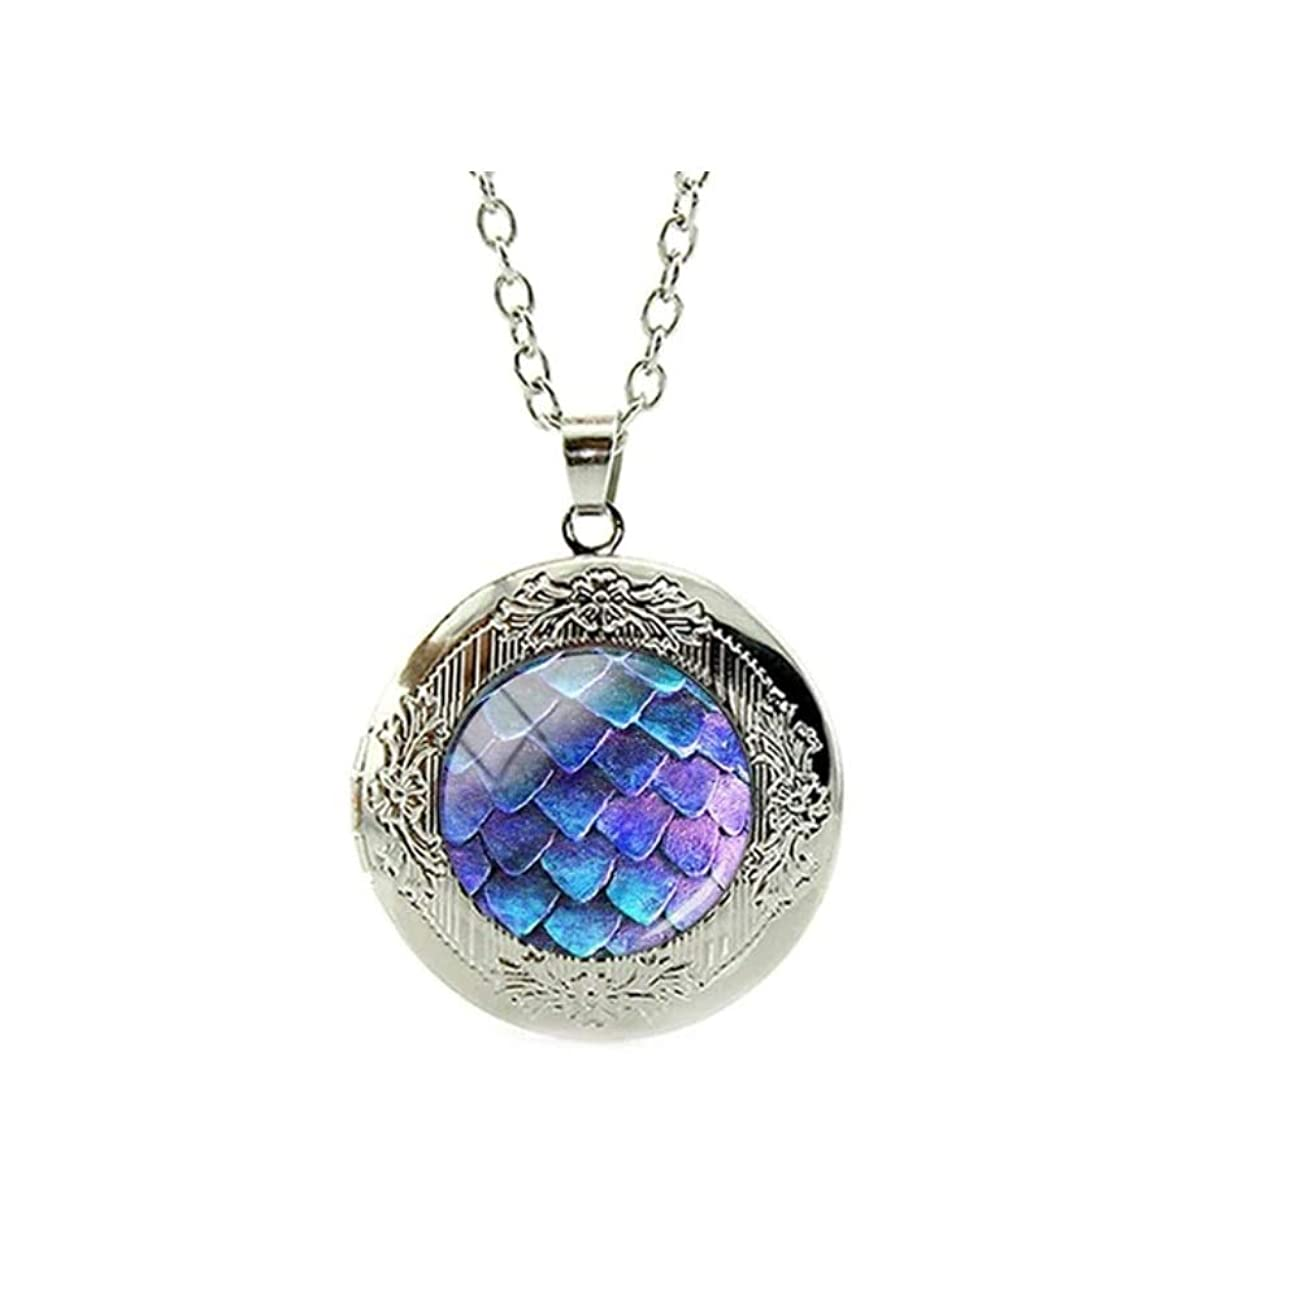 Chandria's Treasures Purple Scale Dragon Egg Engraved Locket Pendant Necklace 18